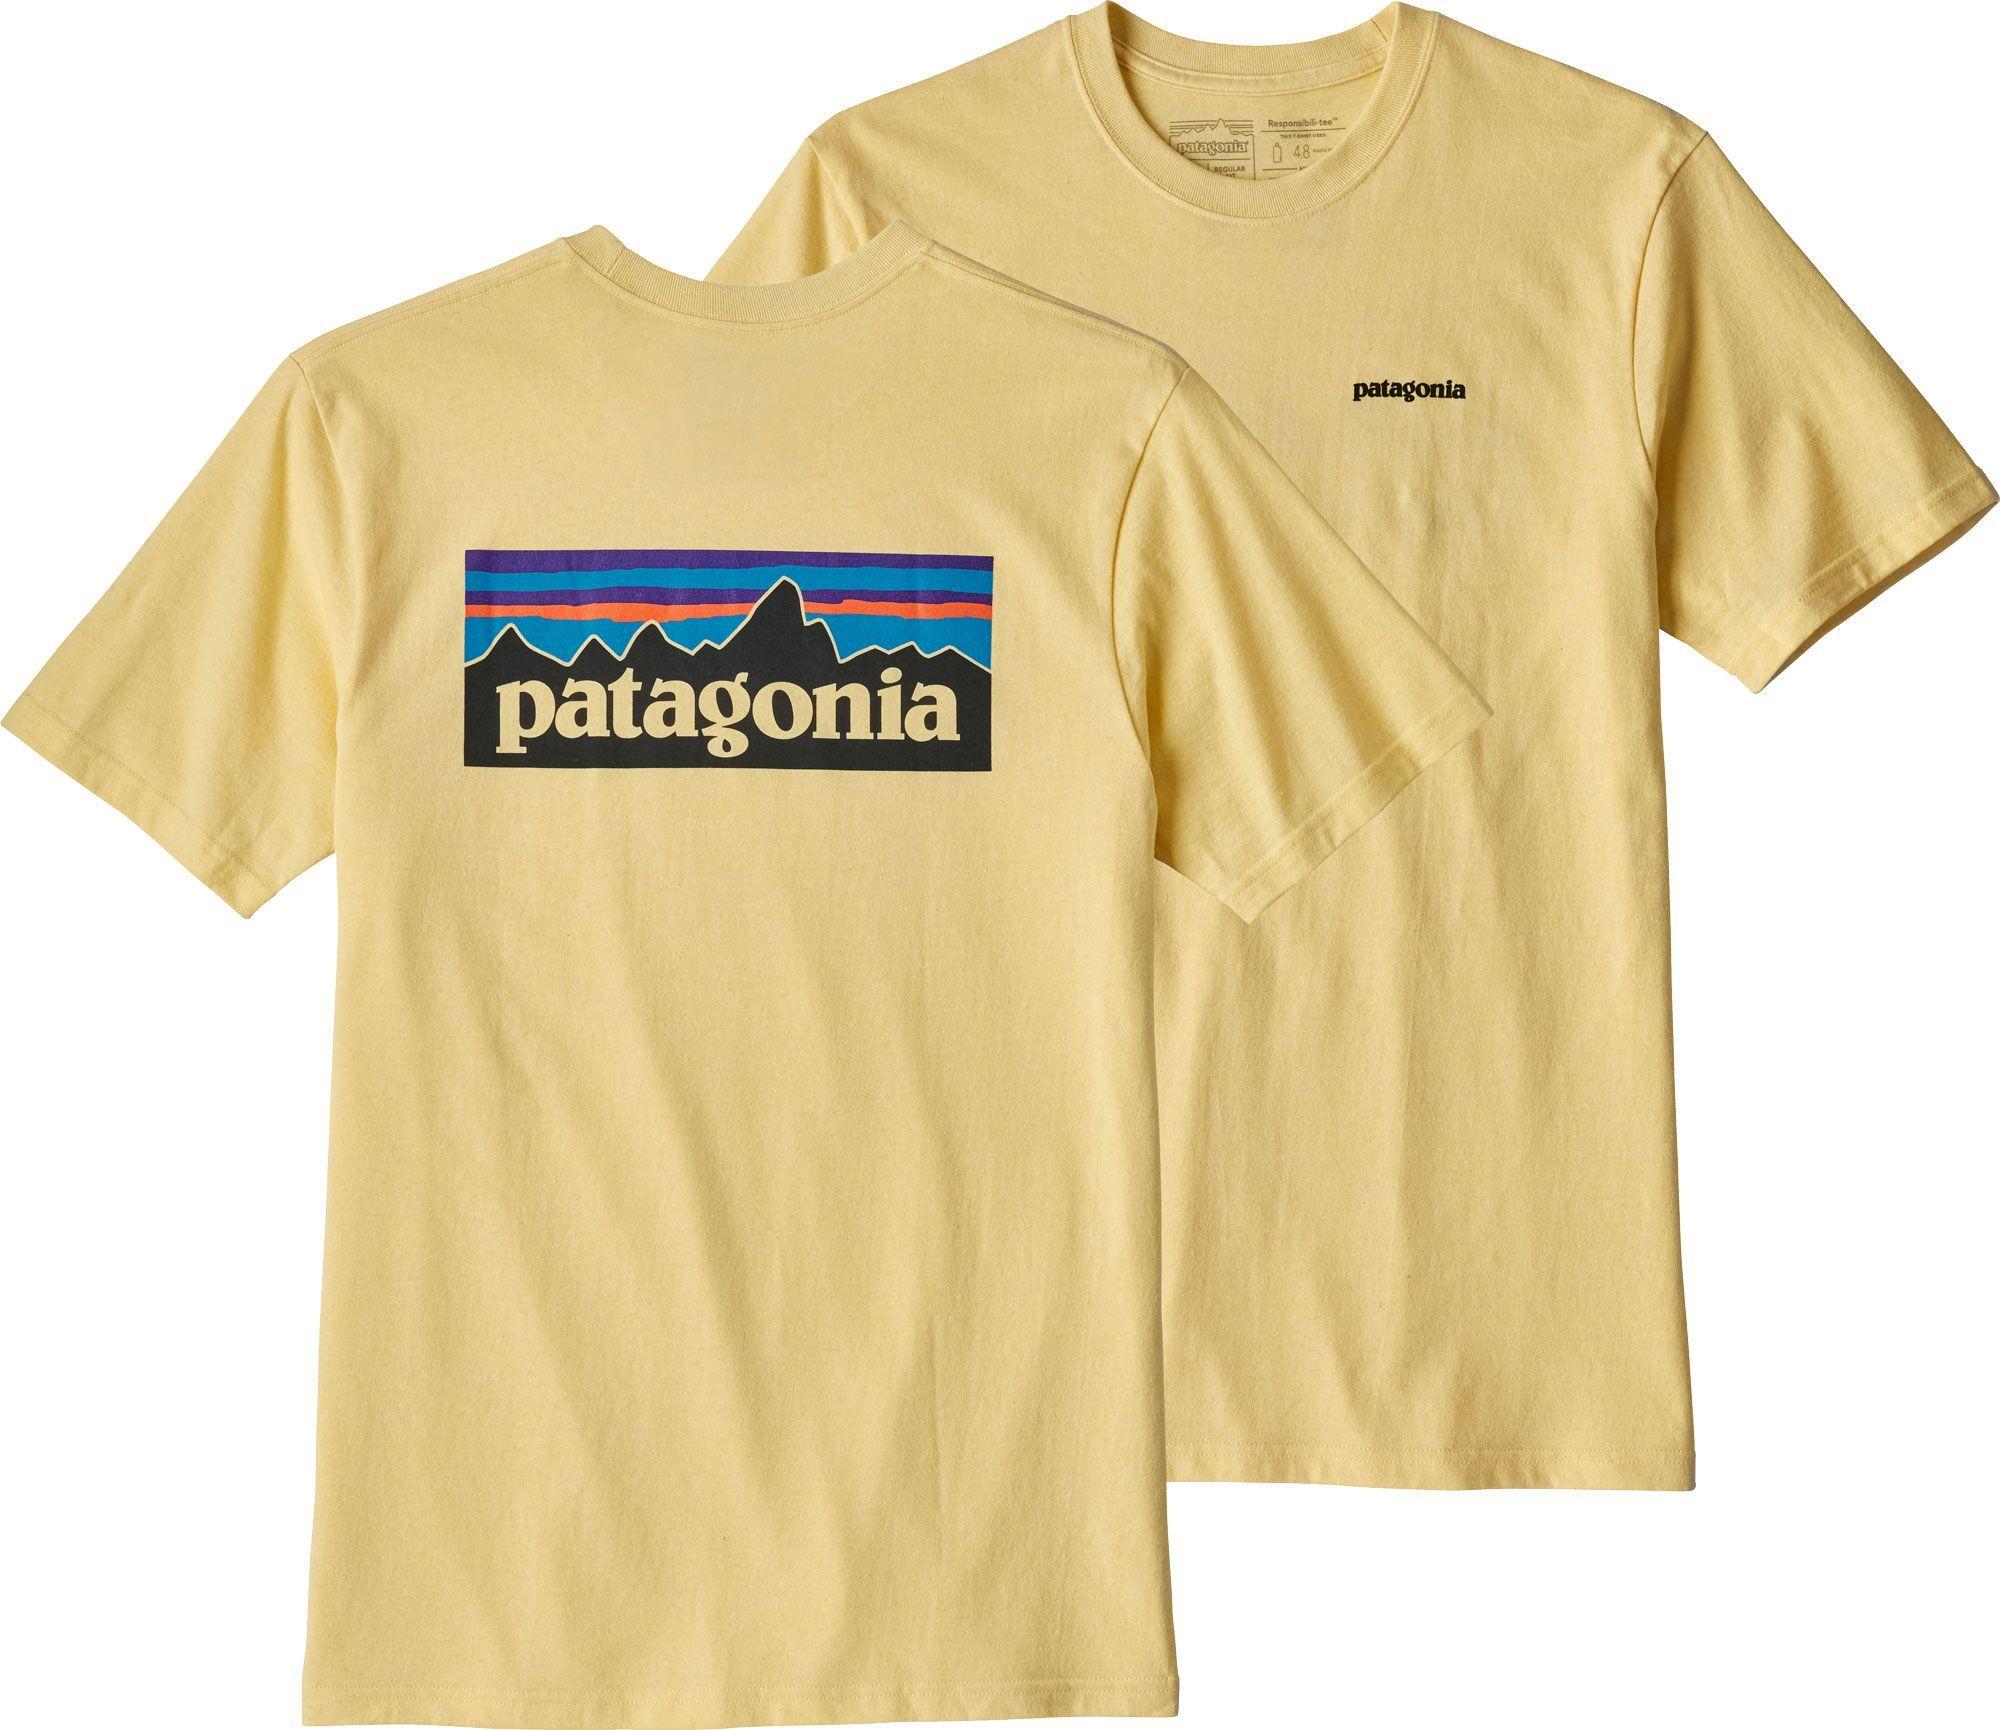 743854d838a8 Patagonia Men s P-6 Logo Responsibili-Tee T-Shirt in 2019